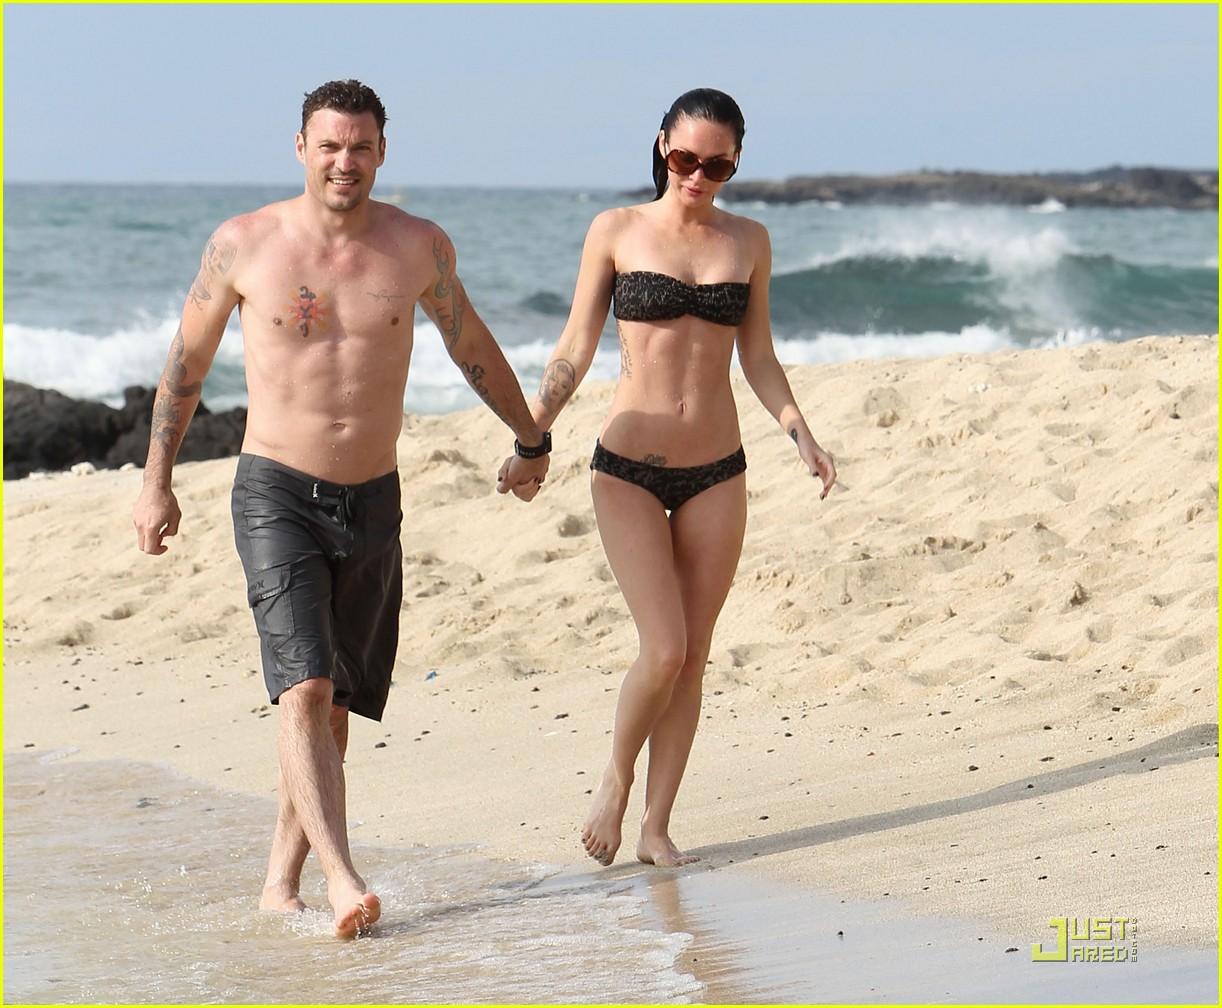 http://3.bp.blogspot.com/_ARNoveiaVyg/TAZ9VxUjsmI/AAAAAAAADr4/Tr94JYvQPzo/s1600/megan-fox-brian-austin-green-kisses-beach-30.jpg